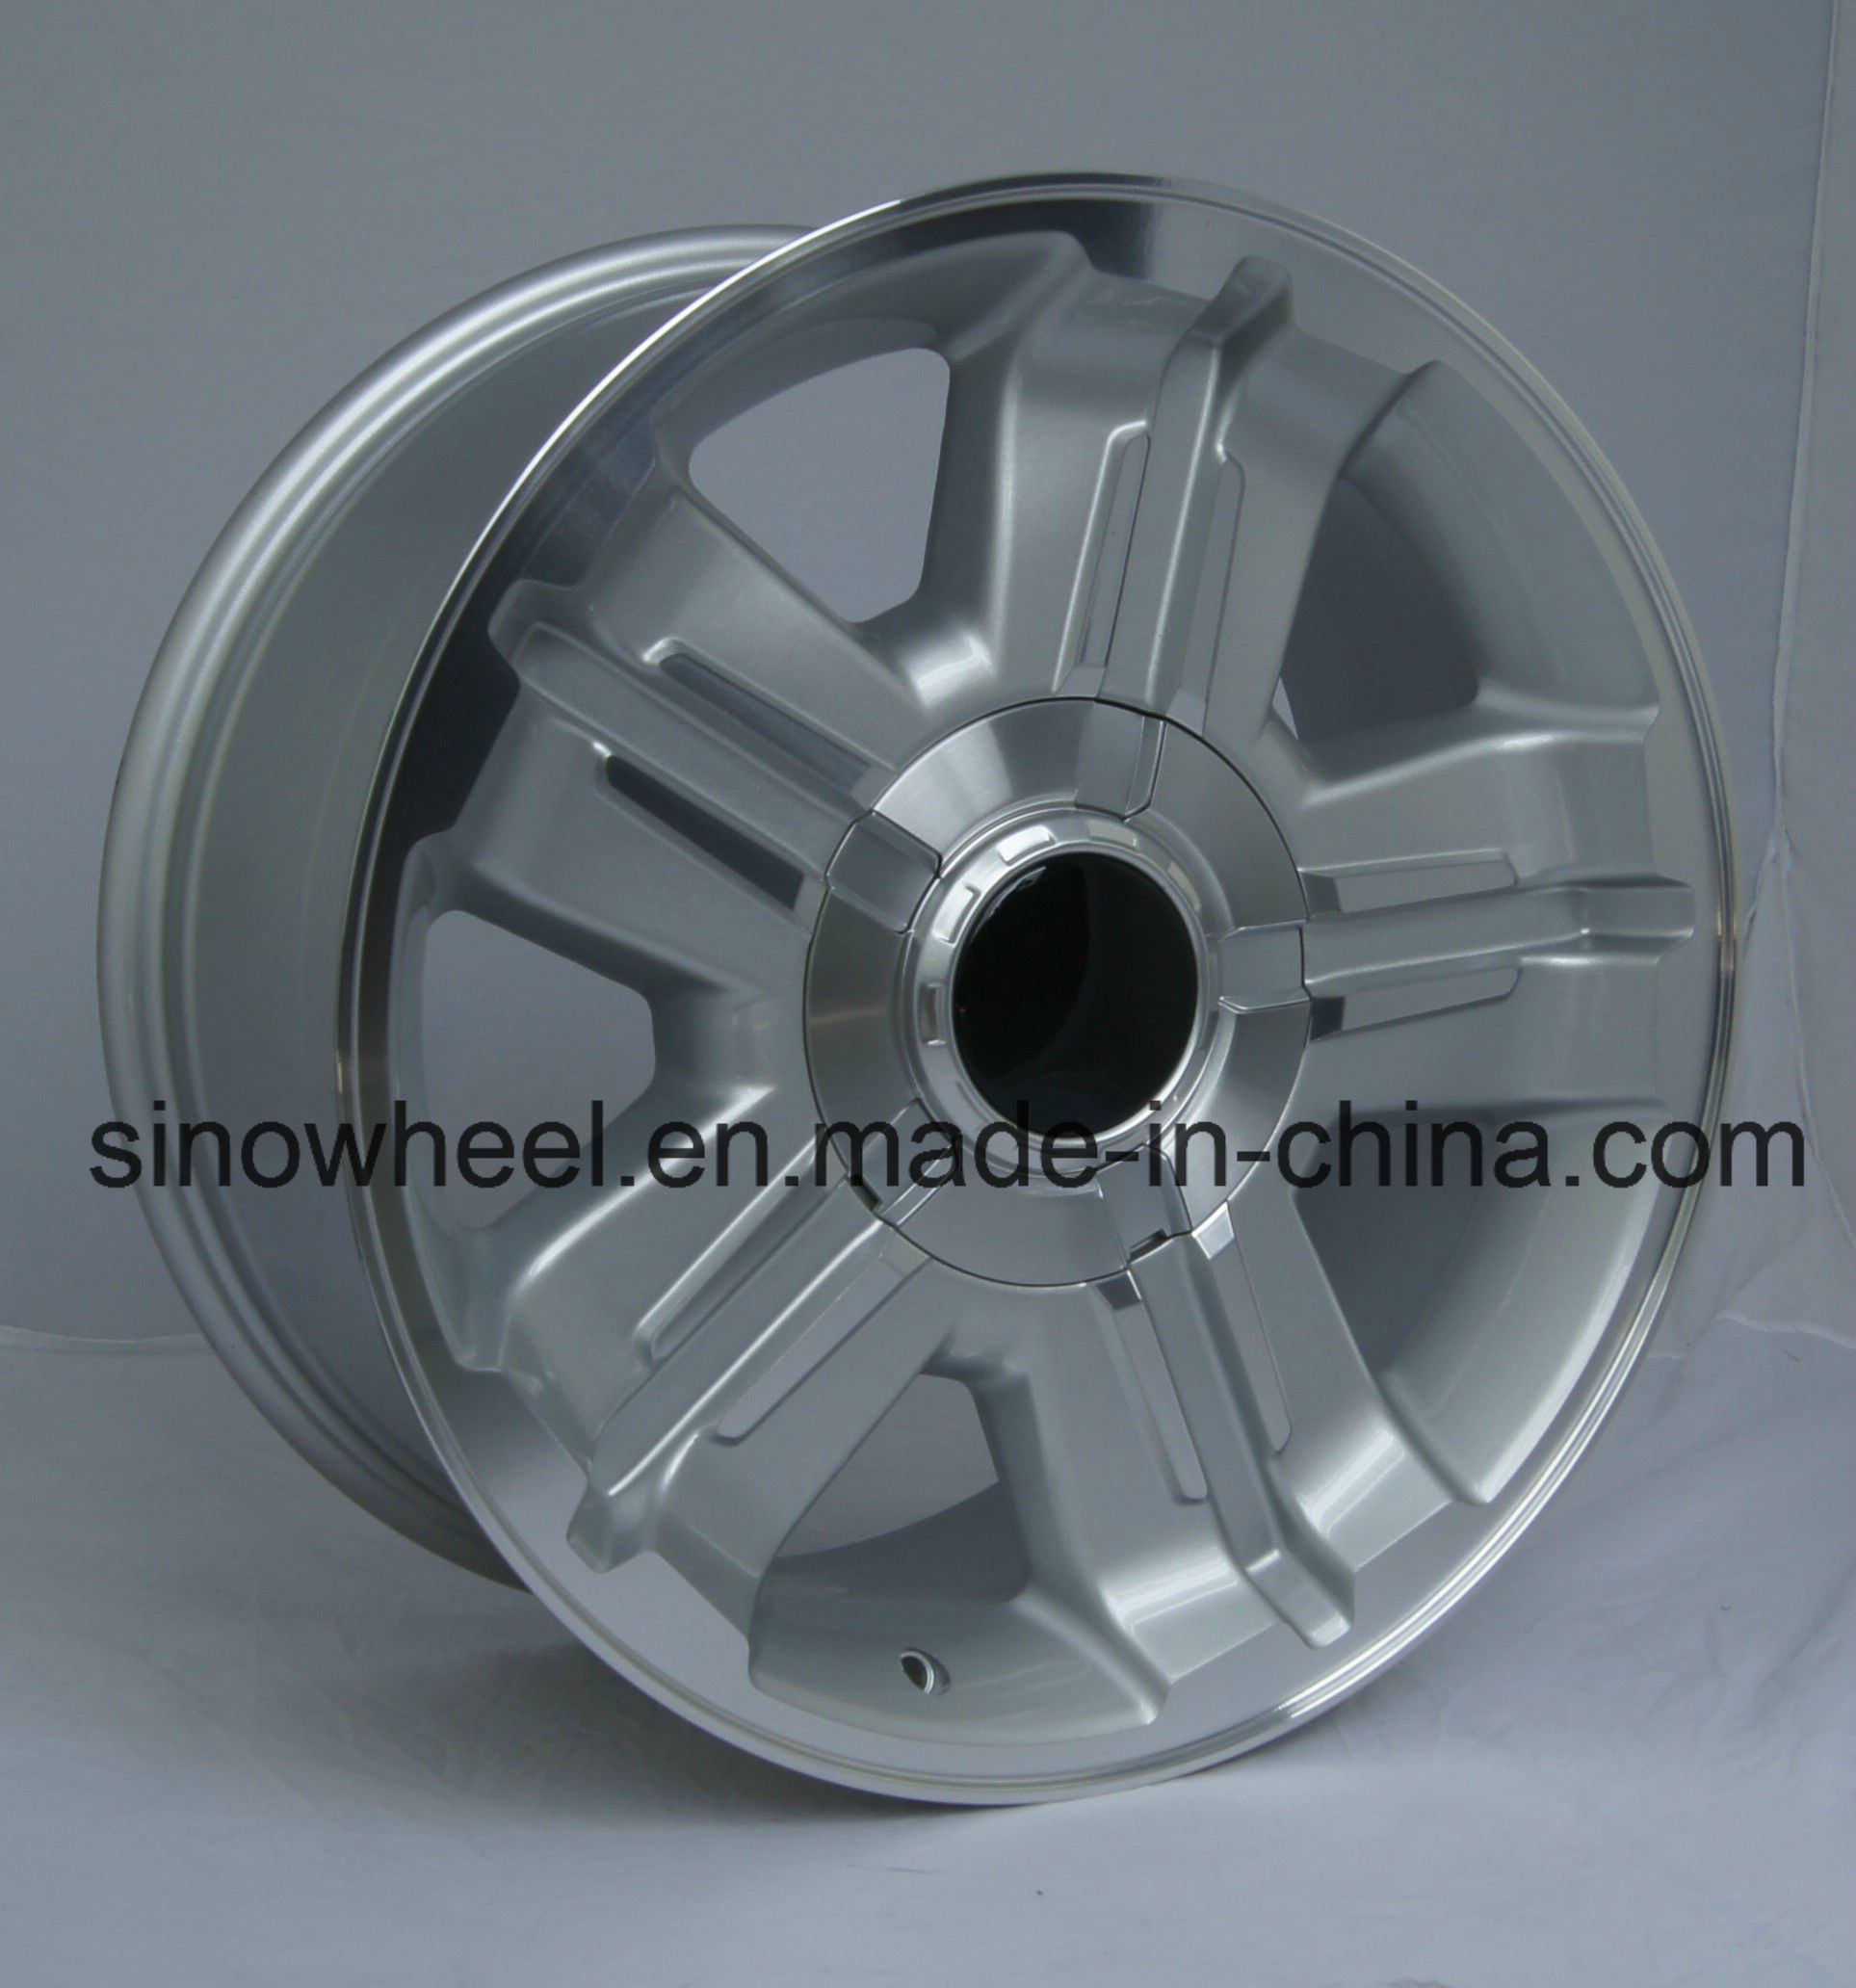 High Quality Replica Alloy Wheel for Chevrolet Silverado Replica Alloy Wheel 22X9.0